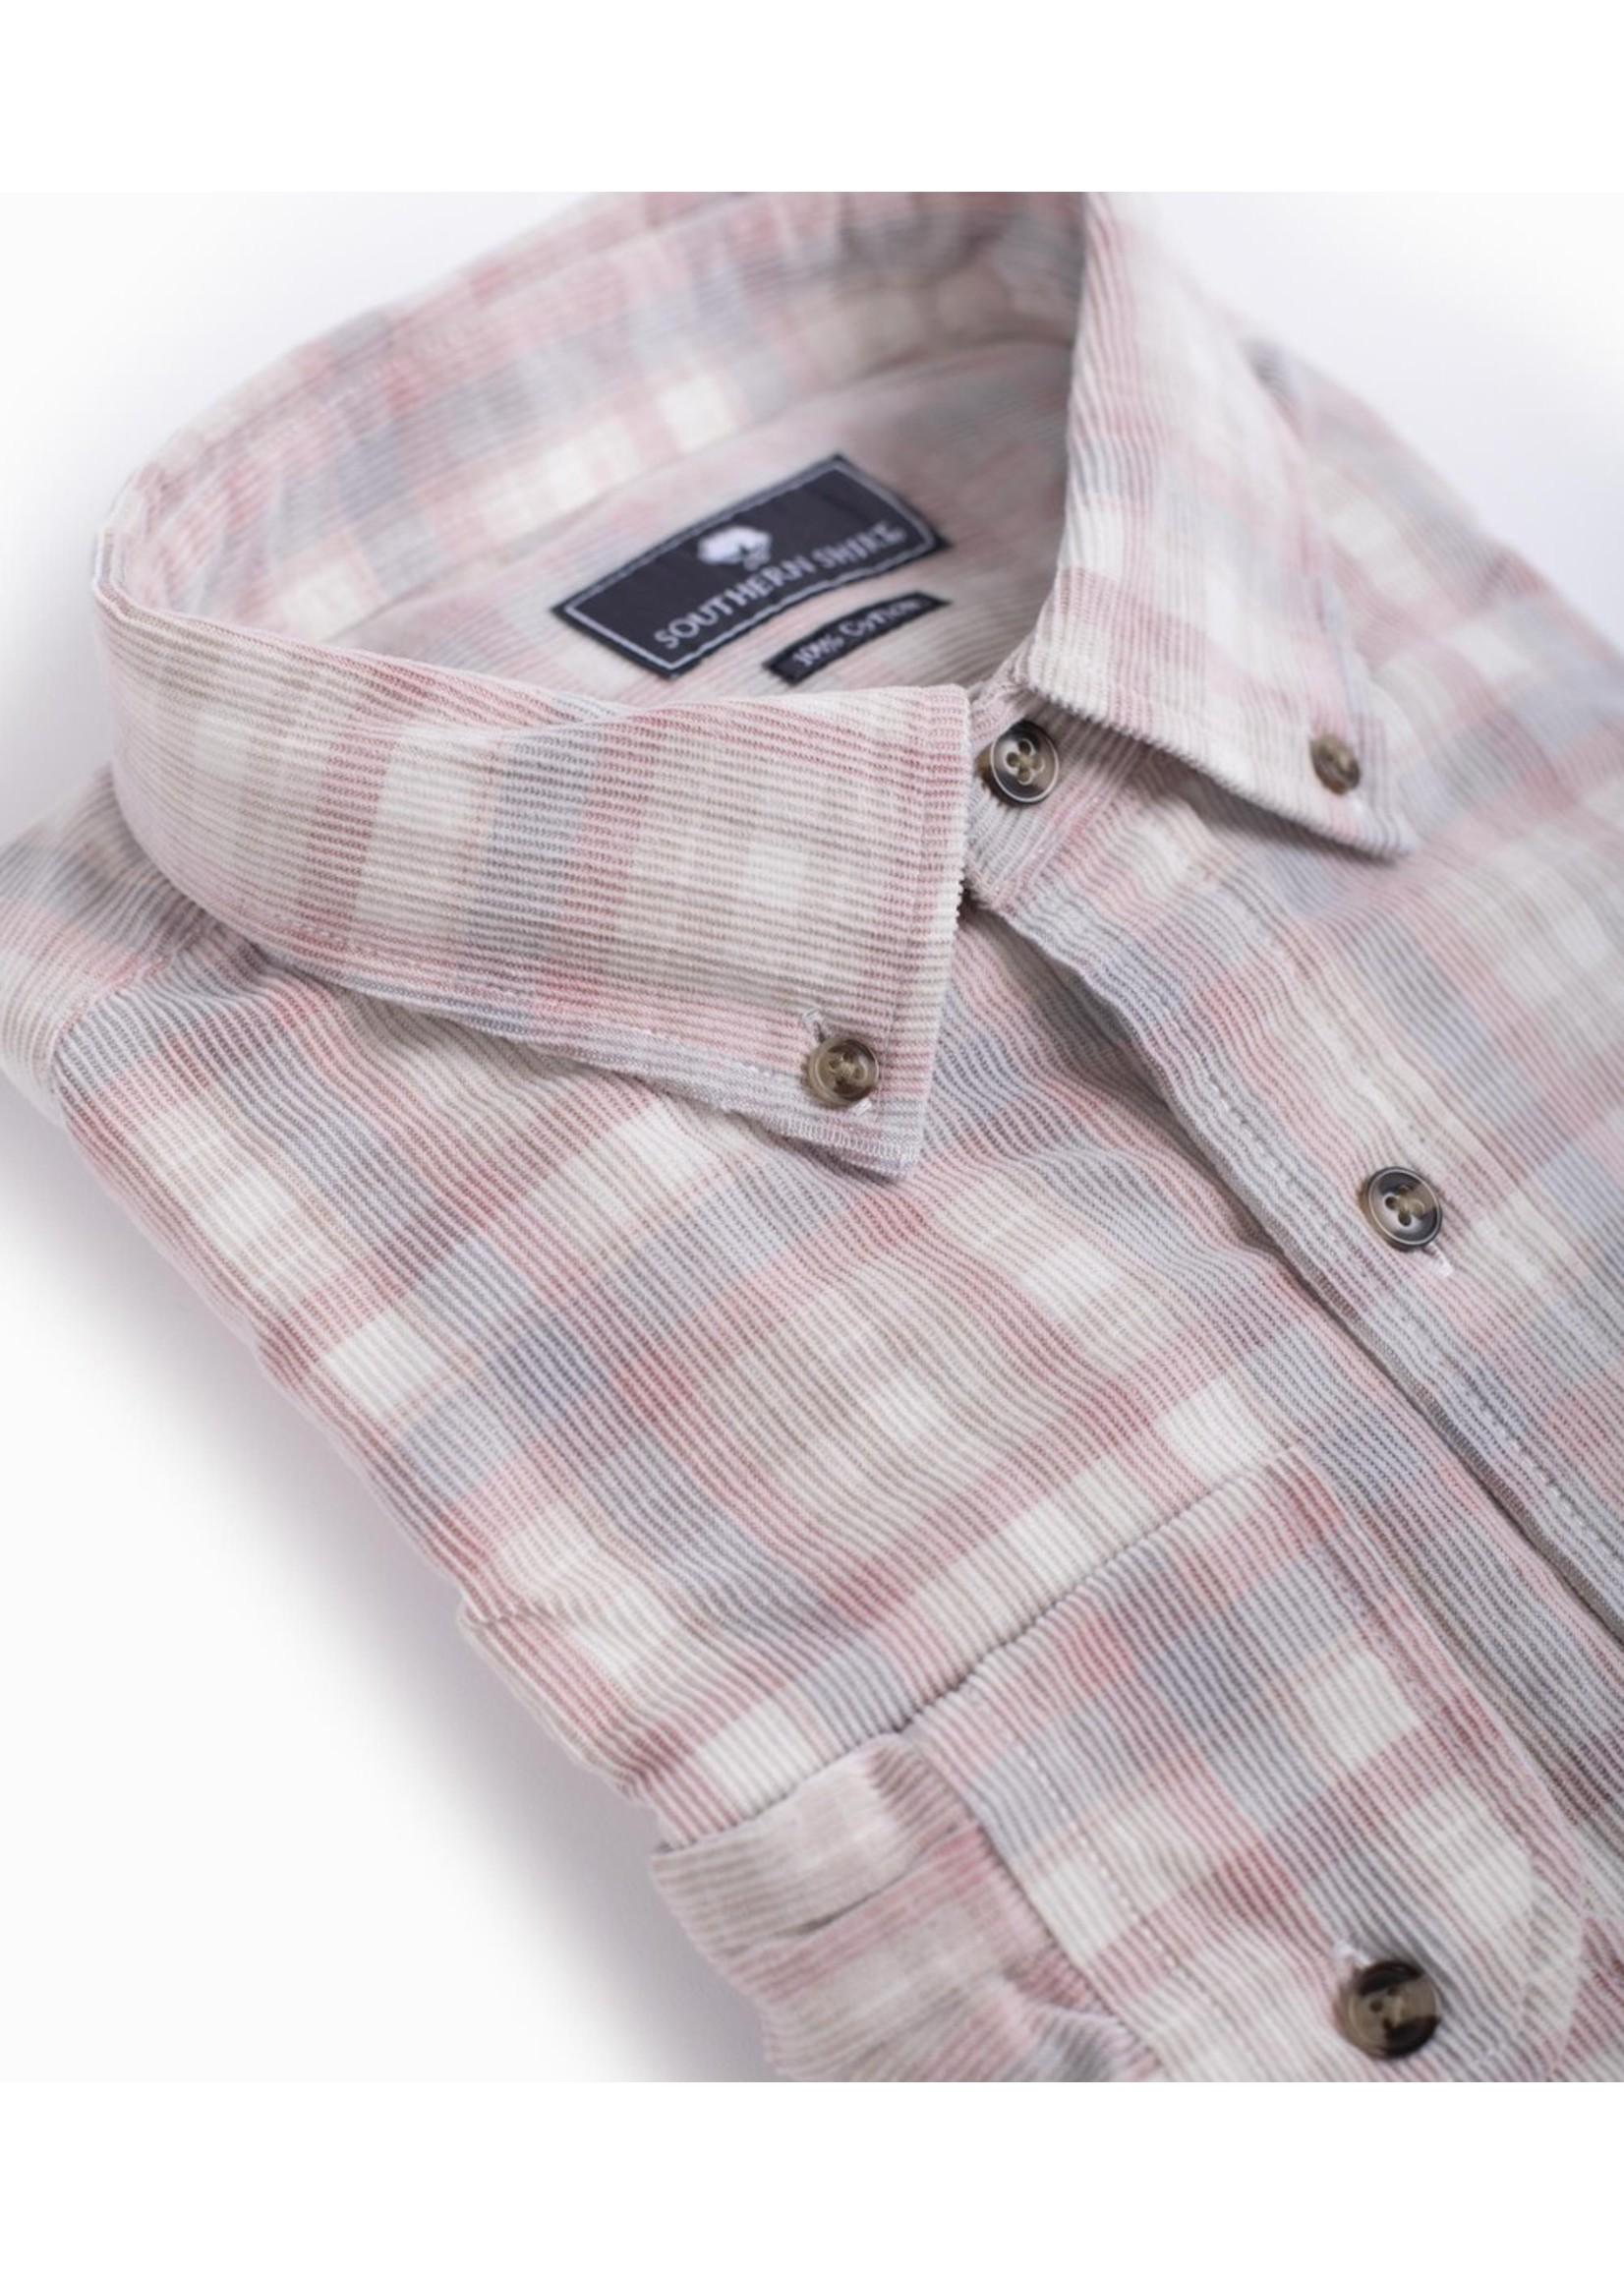 Southern Shirt Braxton Lightweight Corduroy Flannel L/S